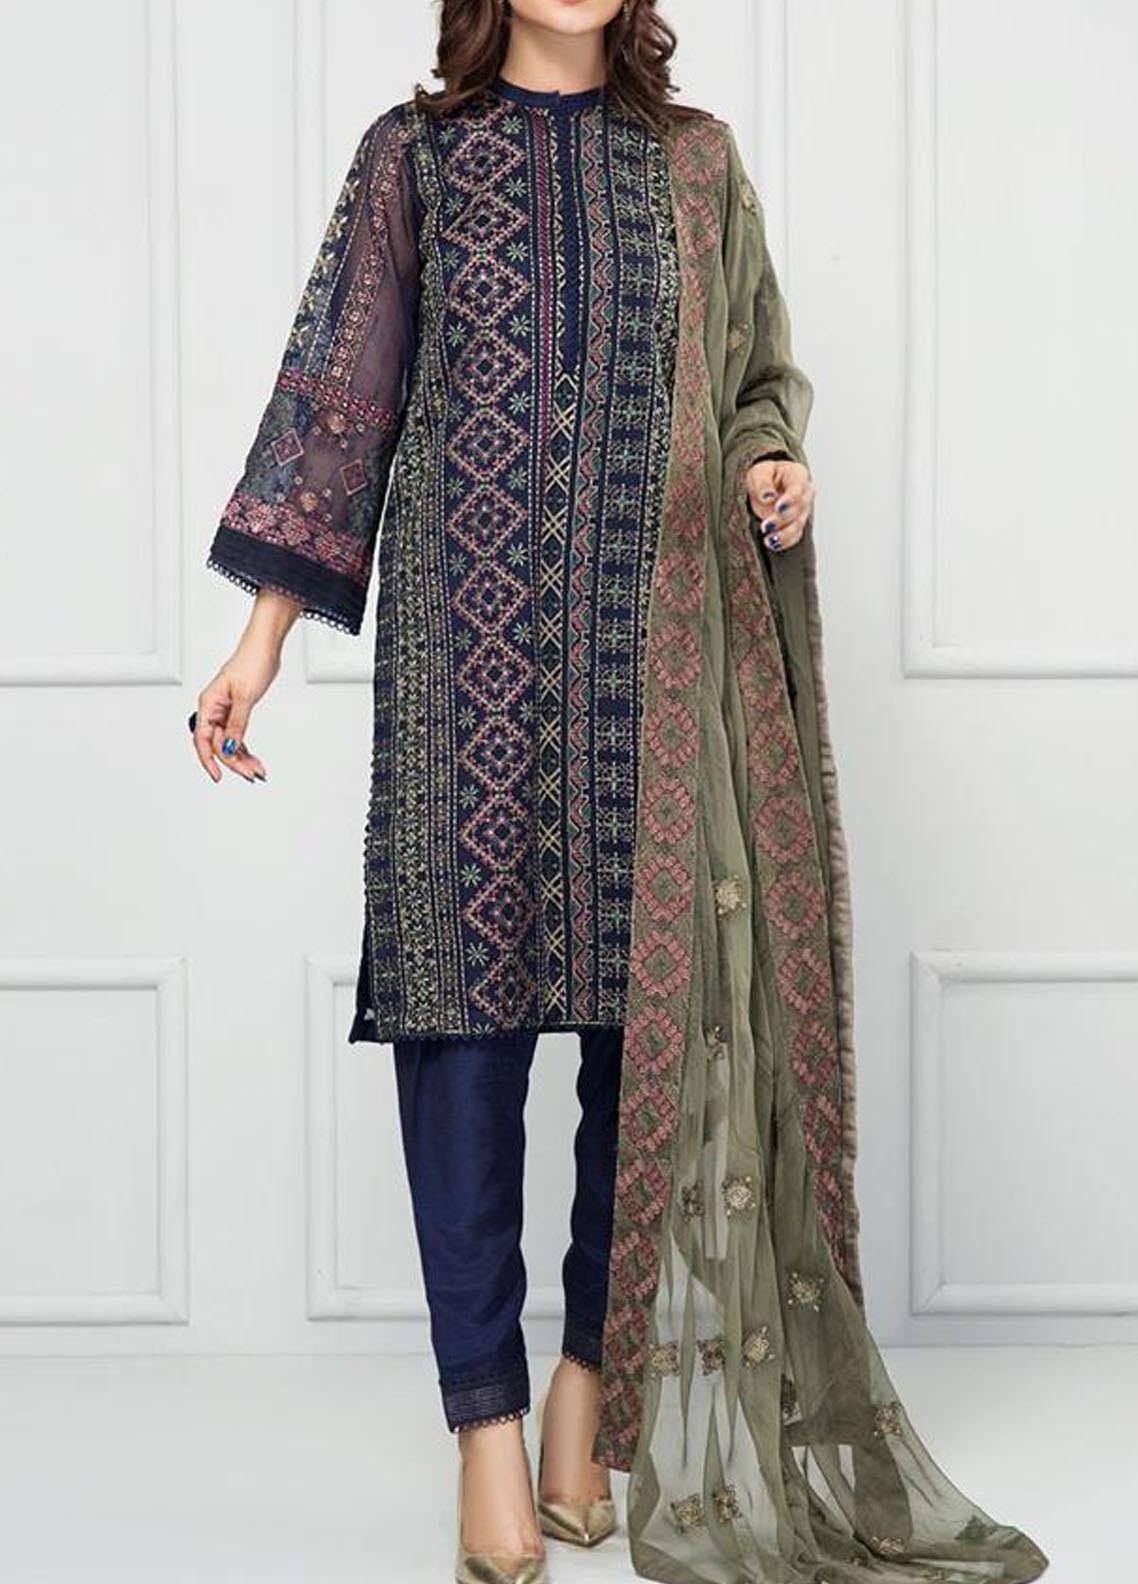 XENIA Formals Embroidered Khaadi Net Stitched 3 Piece Suit XFR-20-137 SCHIPOL